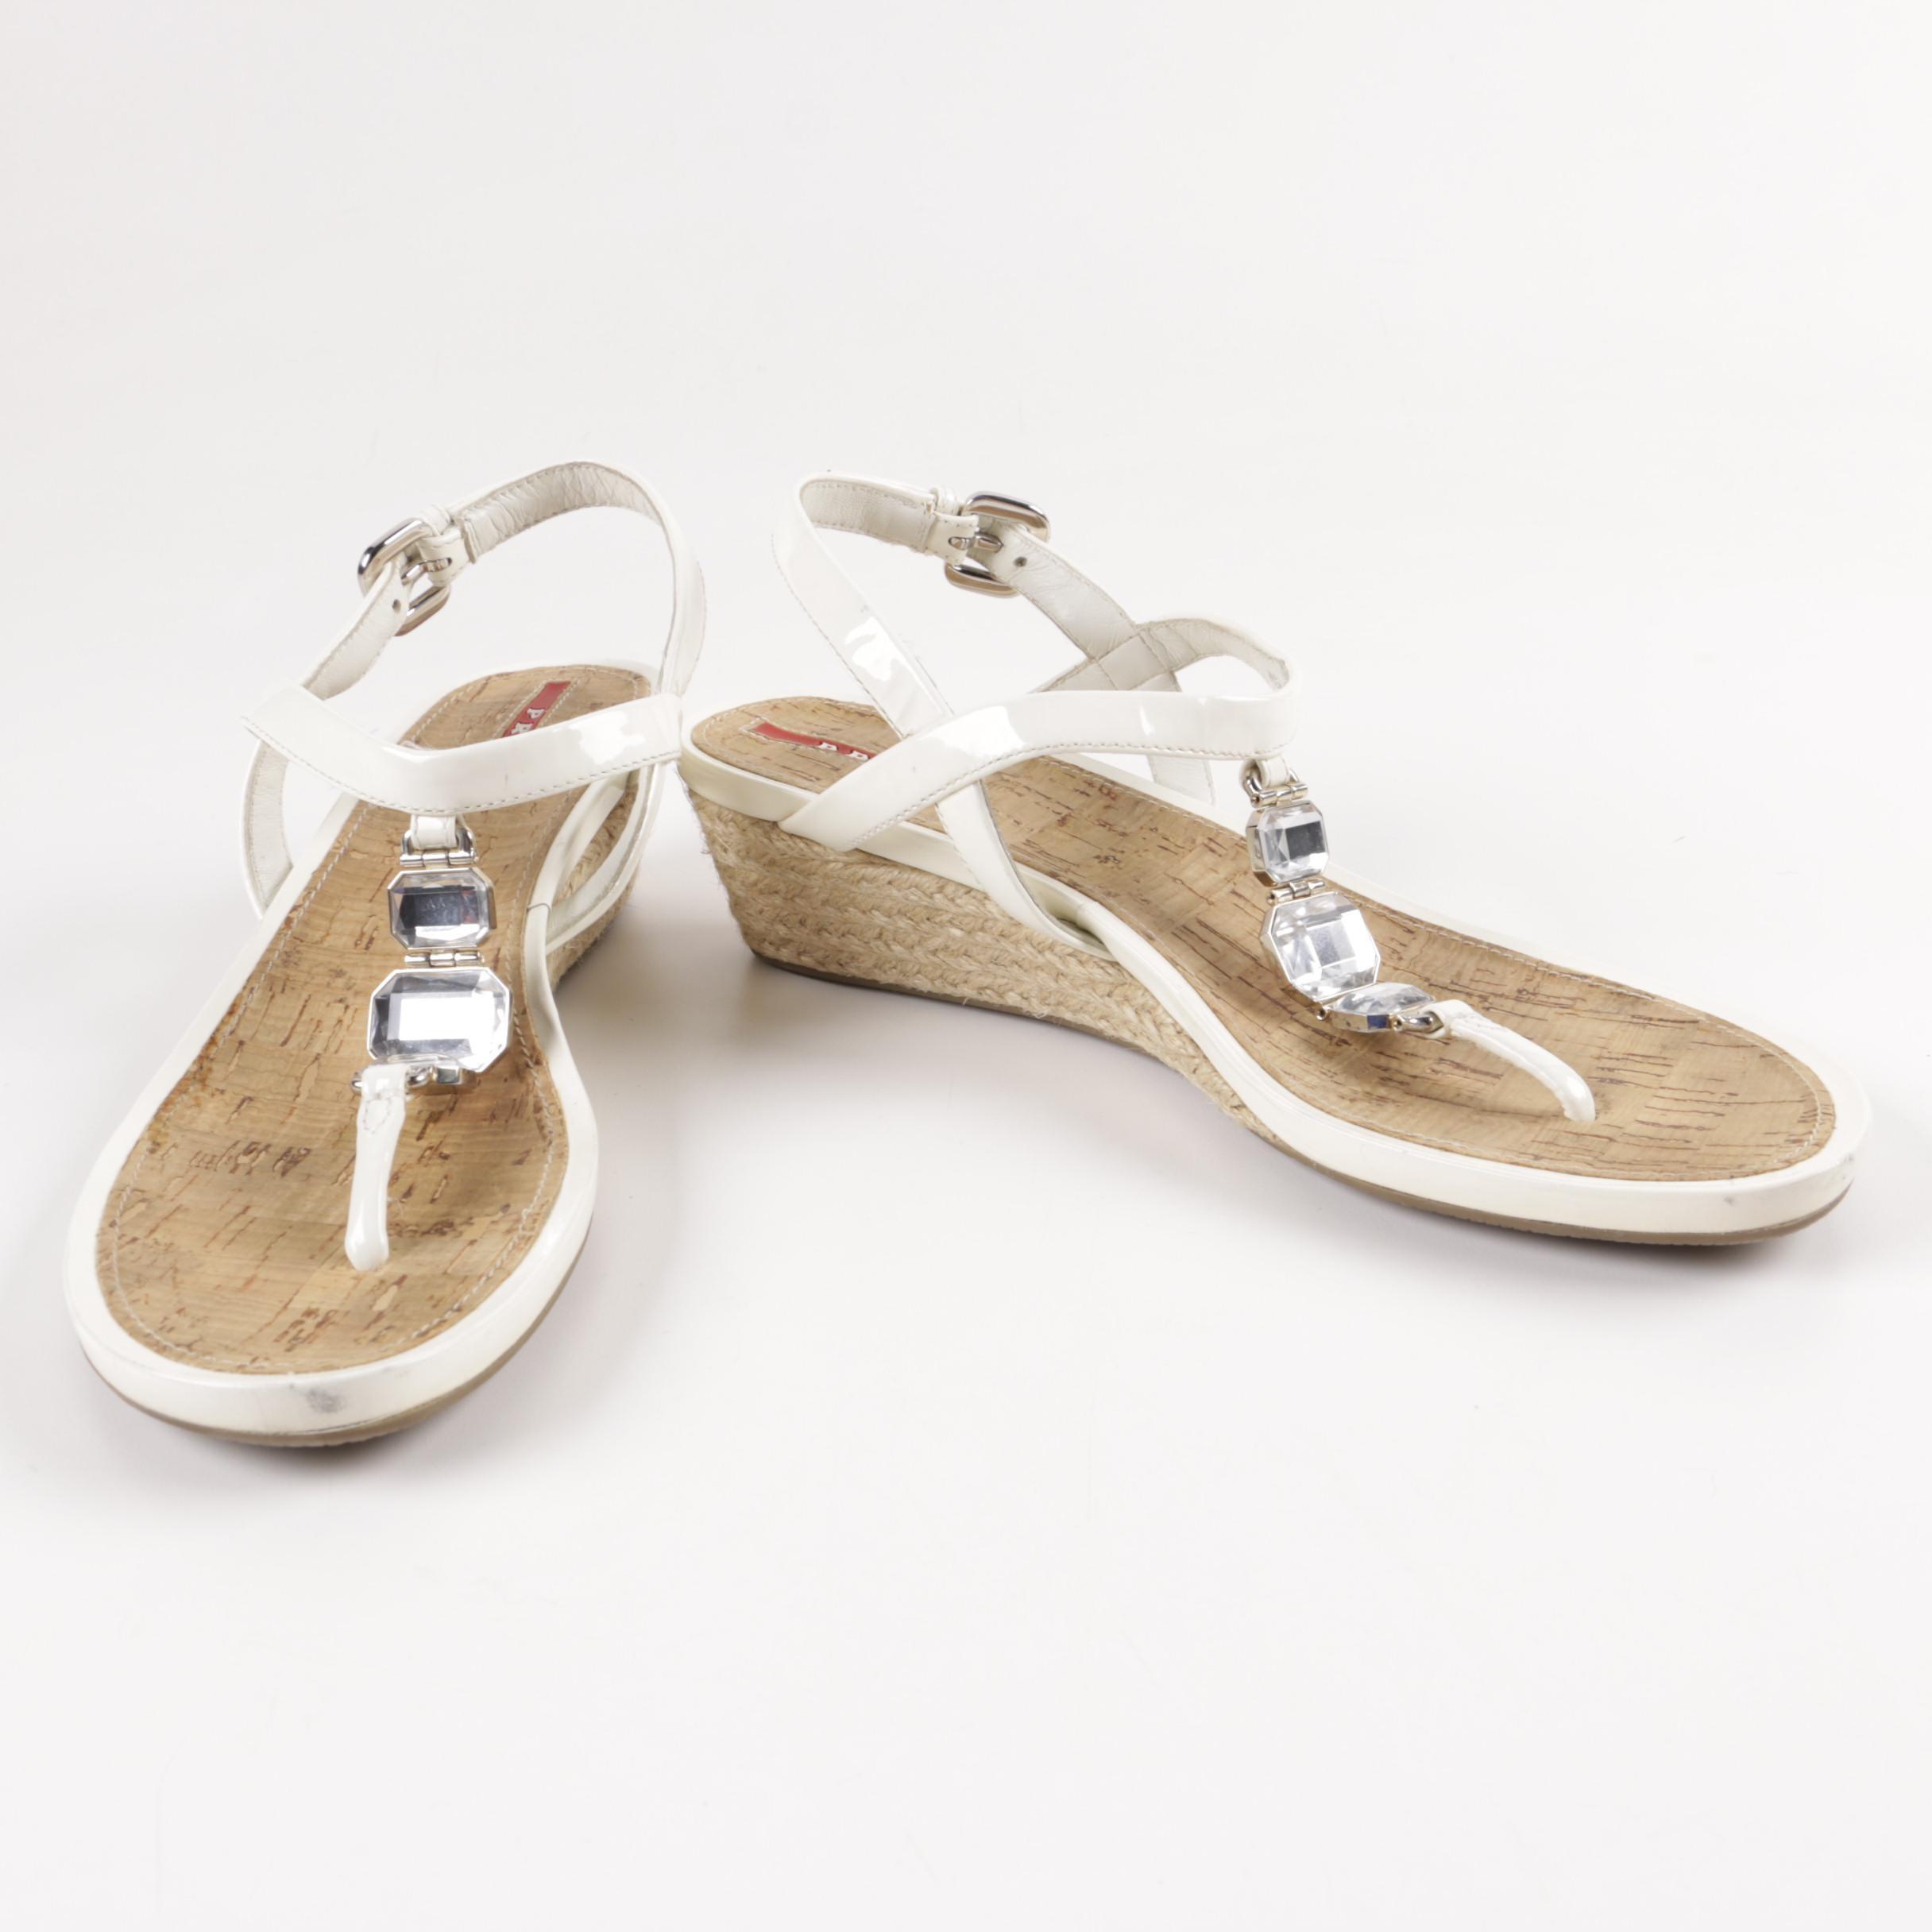 Prada Wedge Sandals with Rhinestones